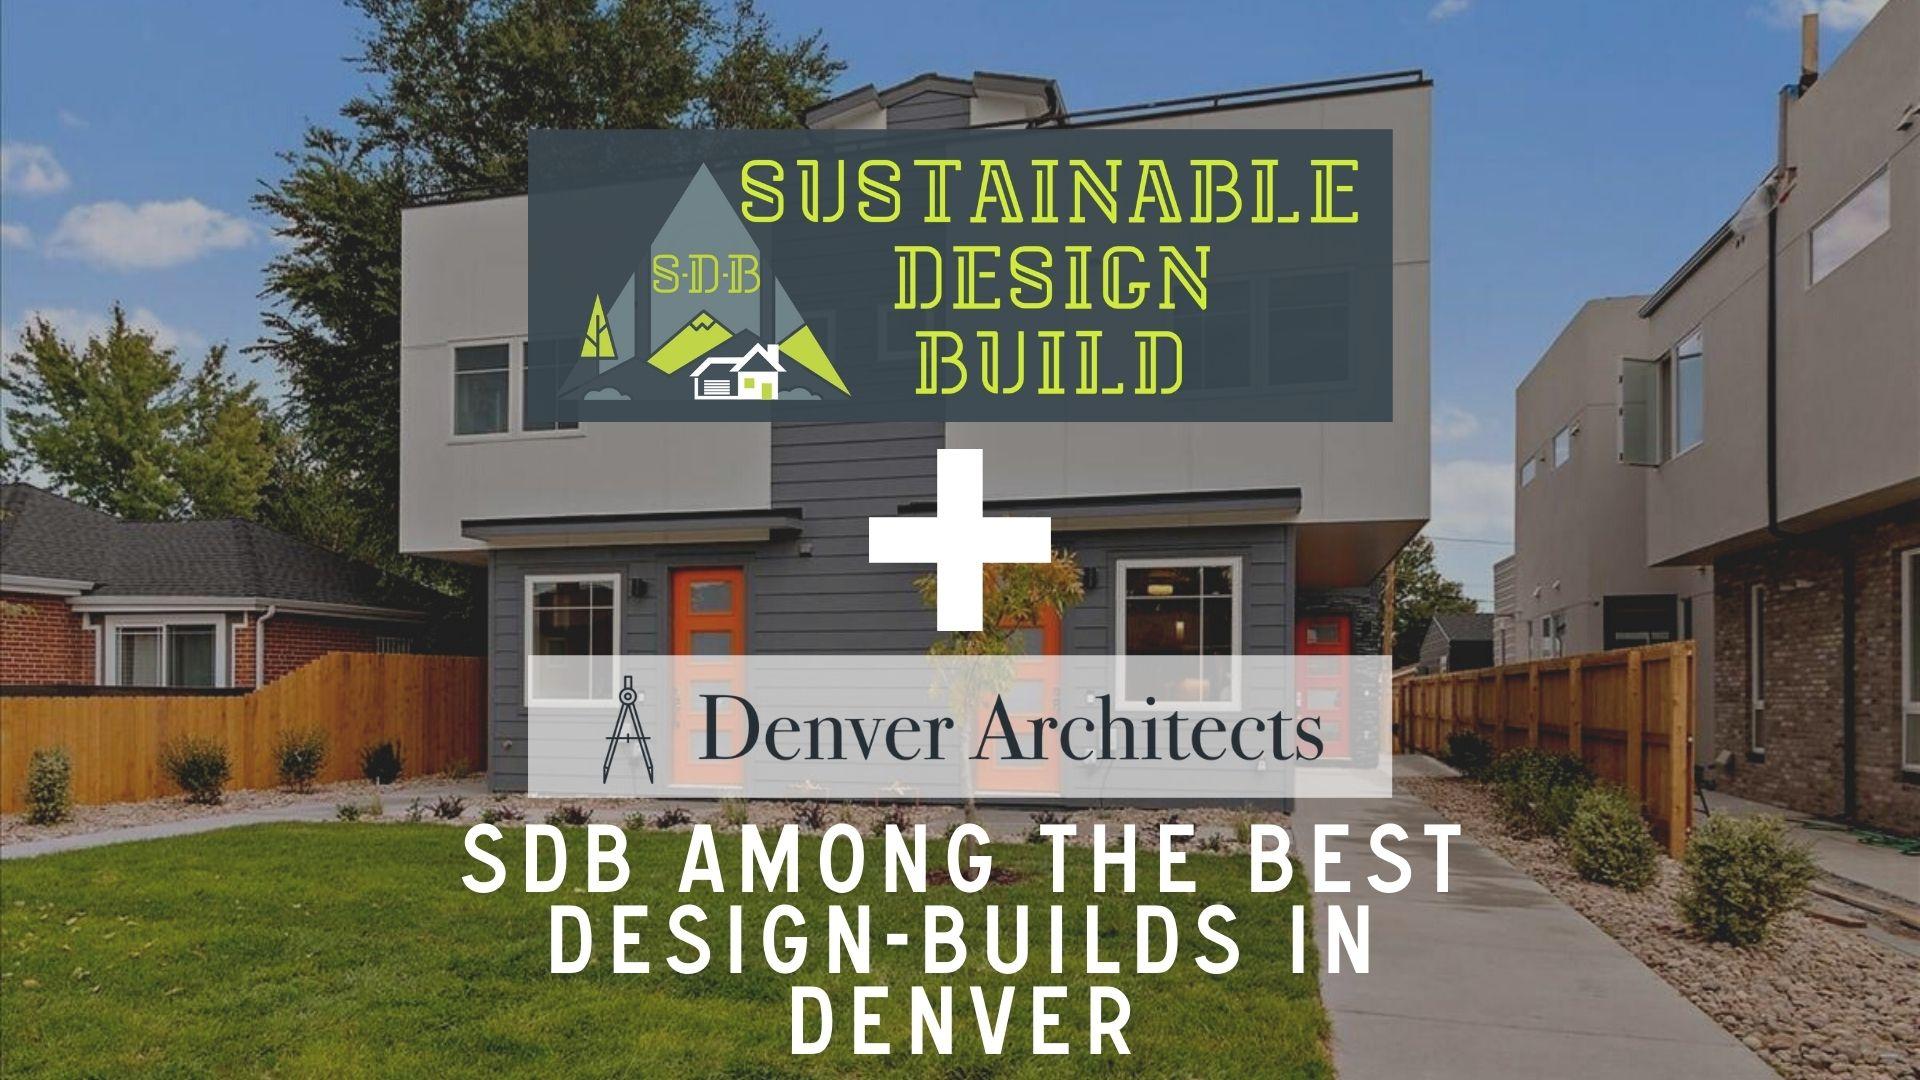 Top Design-Build Companies in Denver